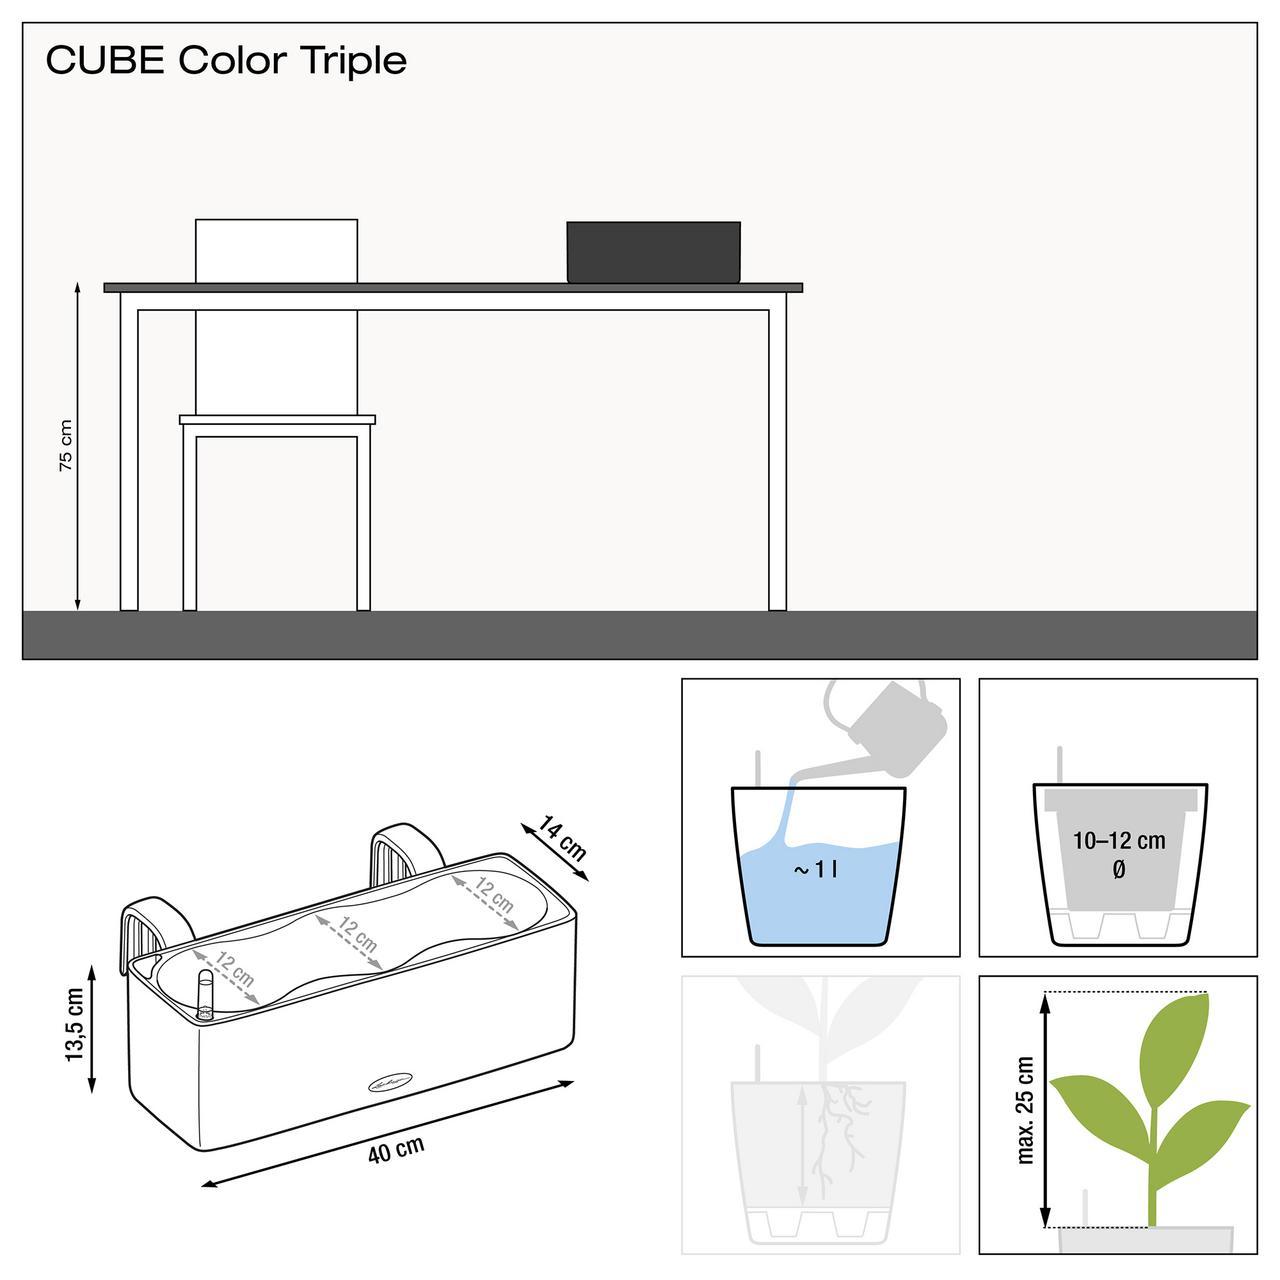 lechuza_cube_color_triple_rozmery